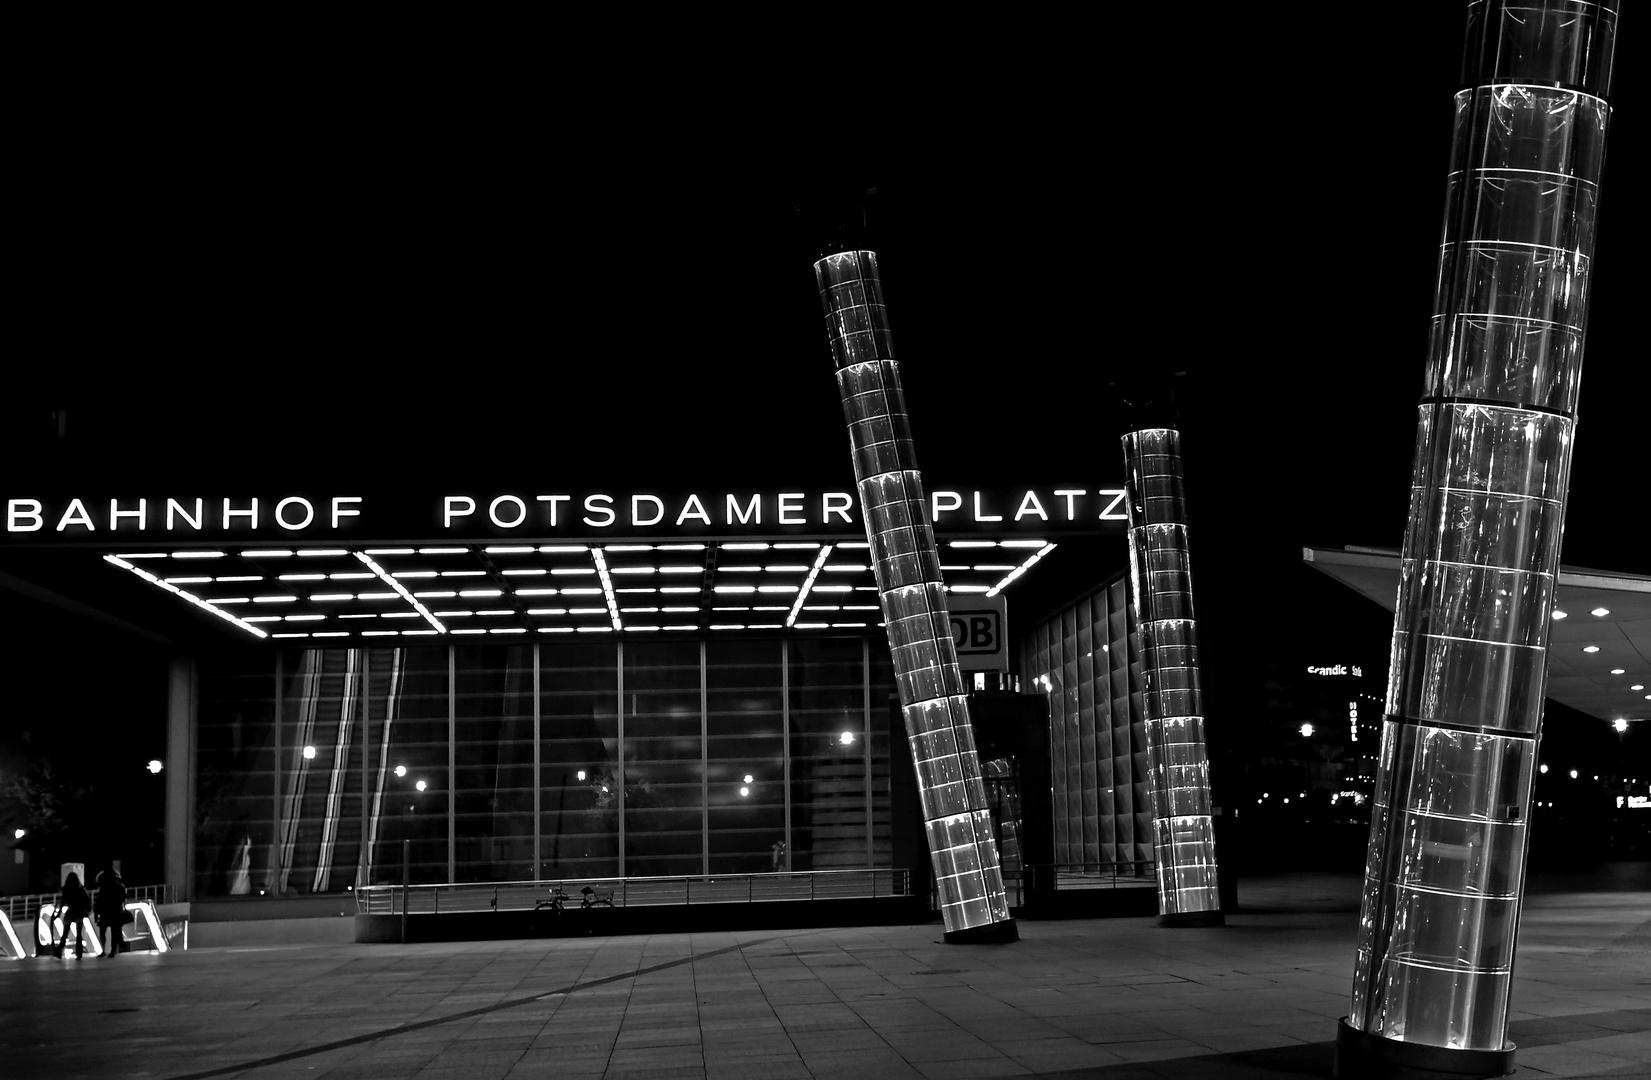 Bahnhof Potsdamer Platz bei Nacht